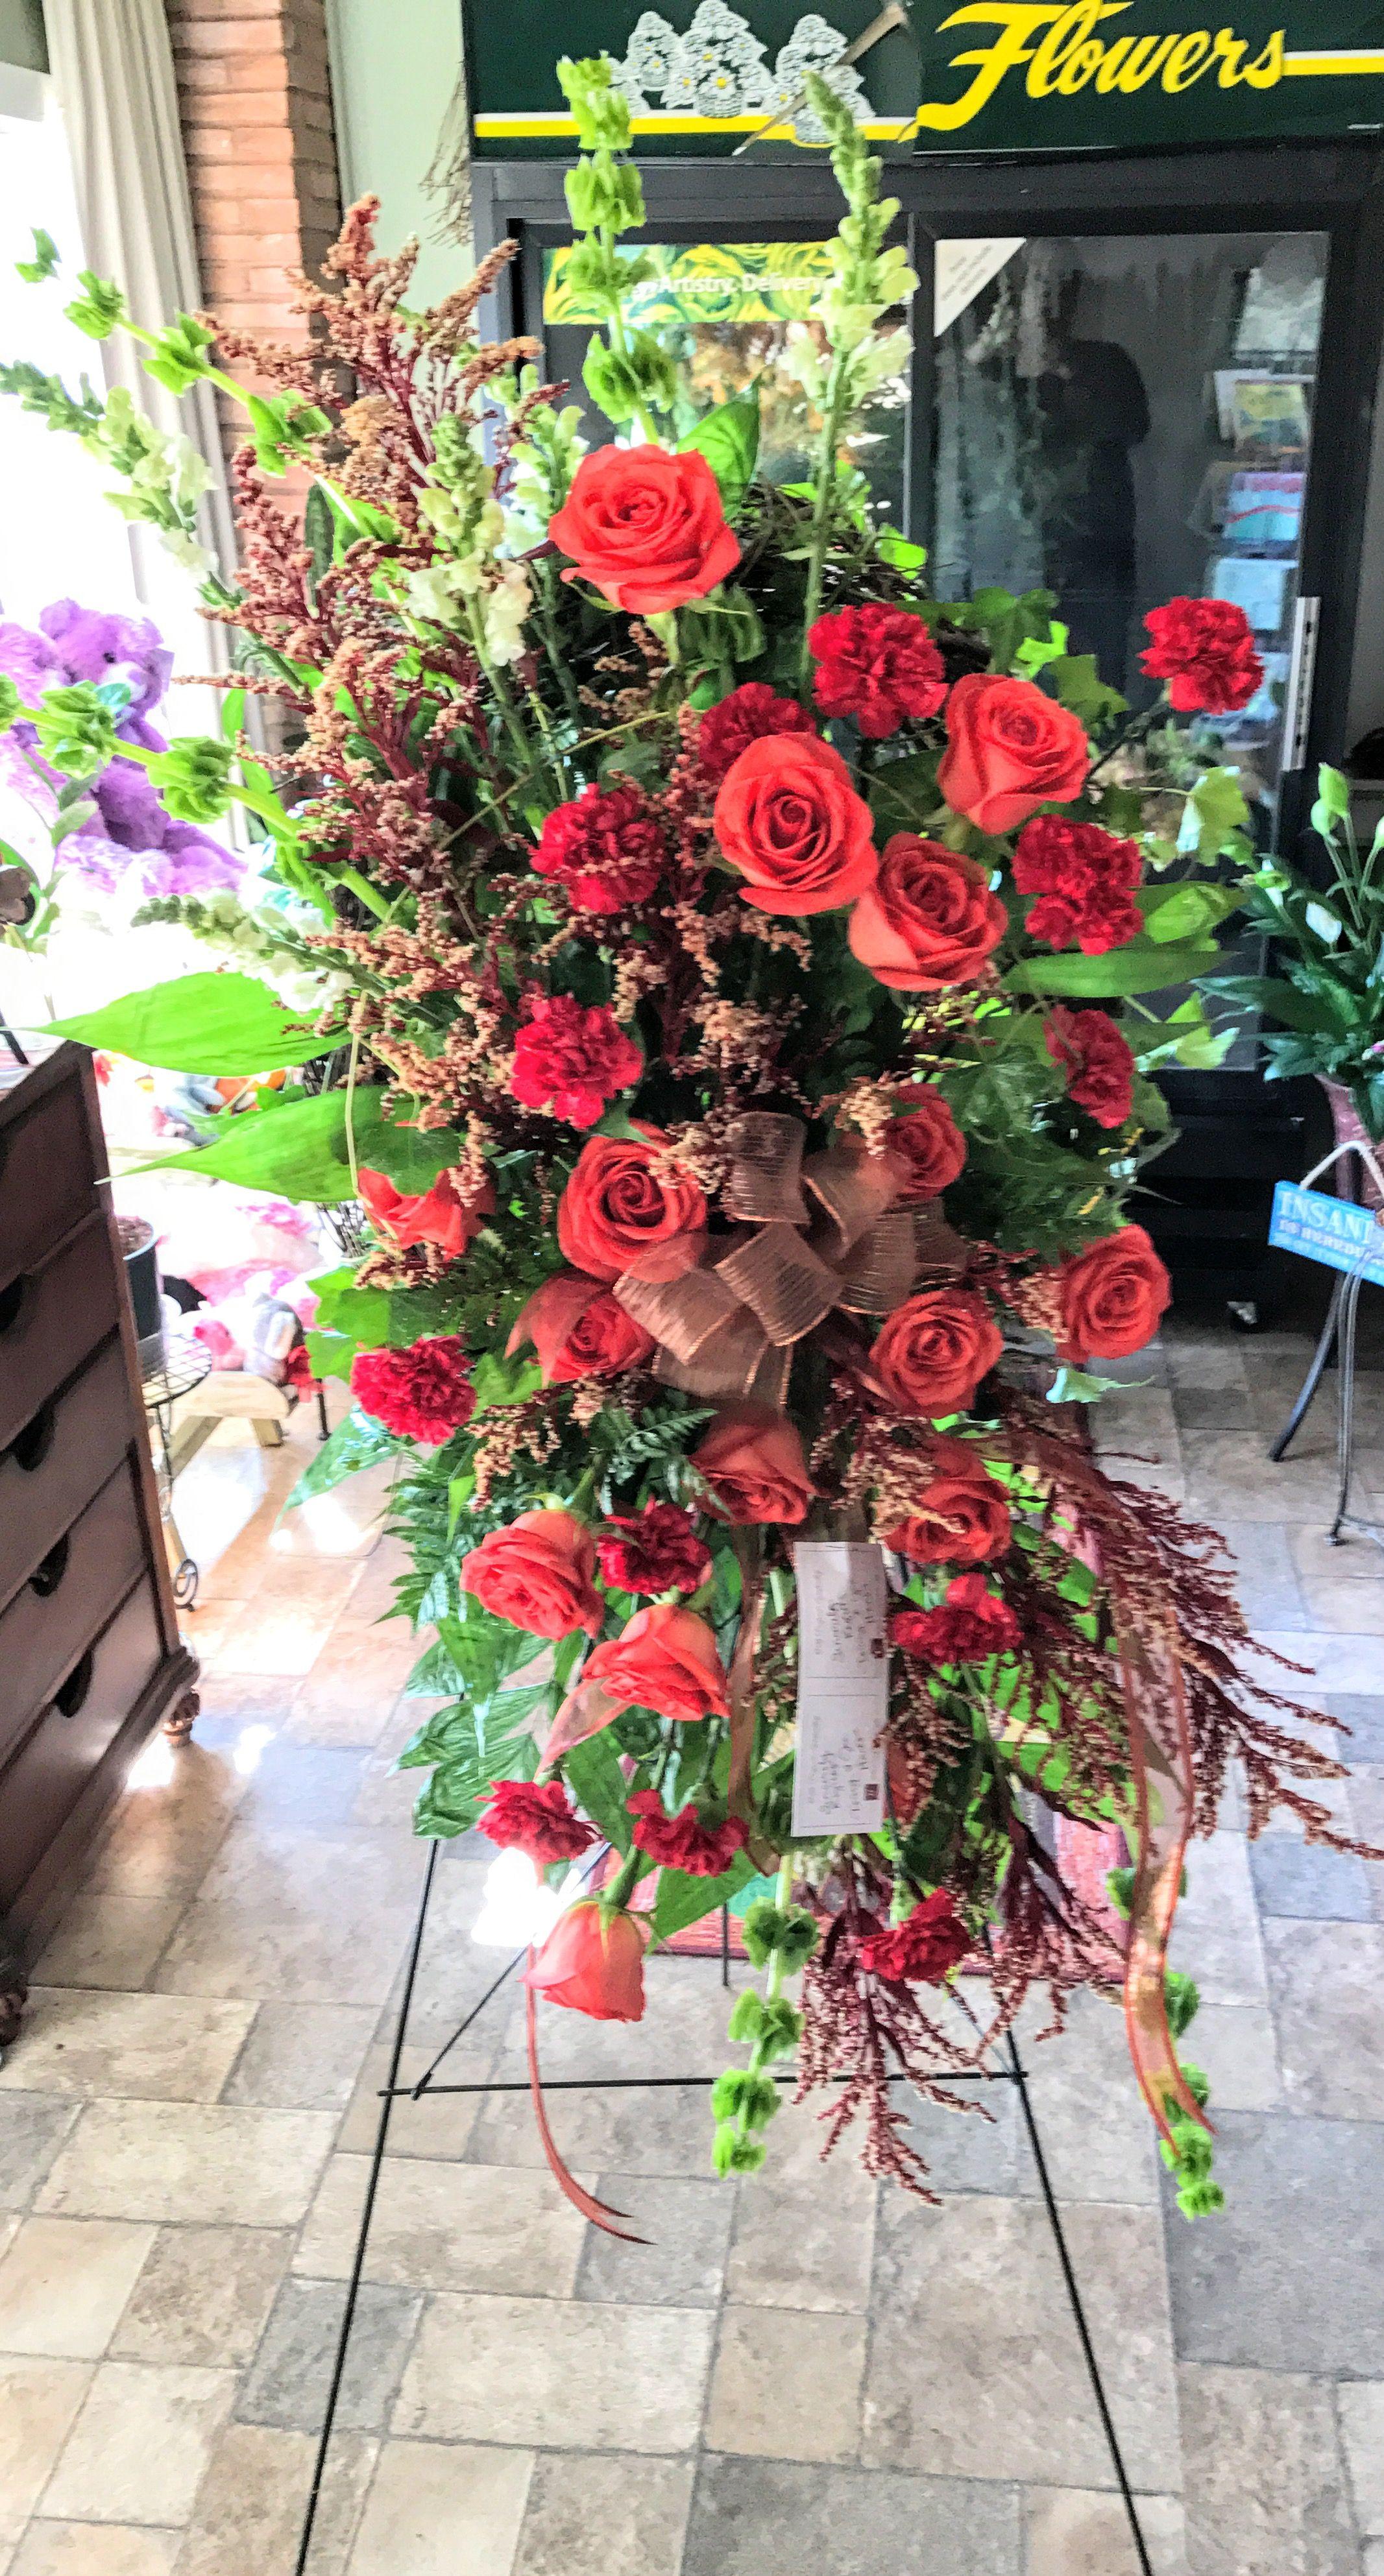 Pin By Karla Cochran On Whitehouse Flowers Gifts Portfolio